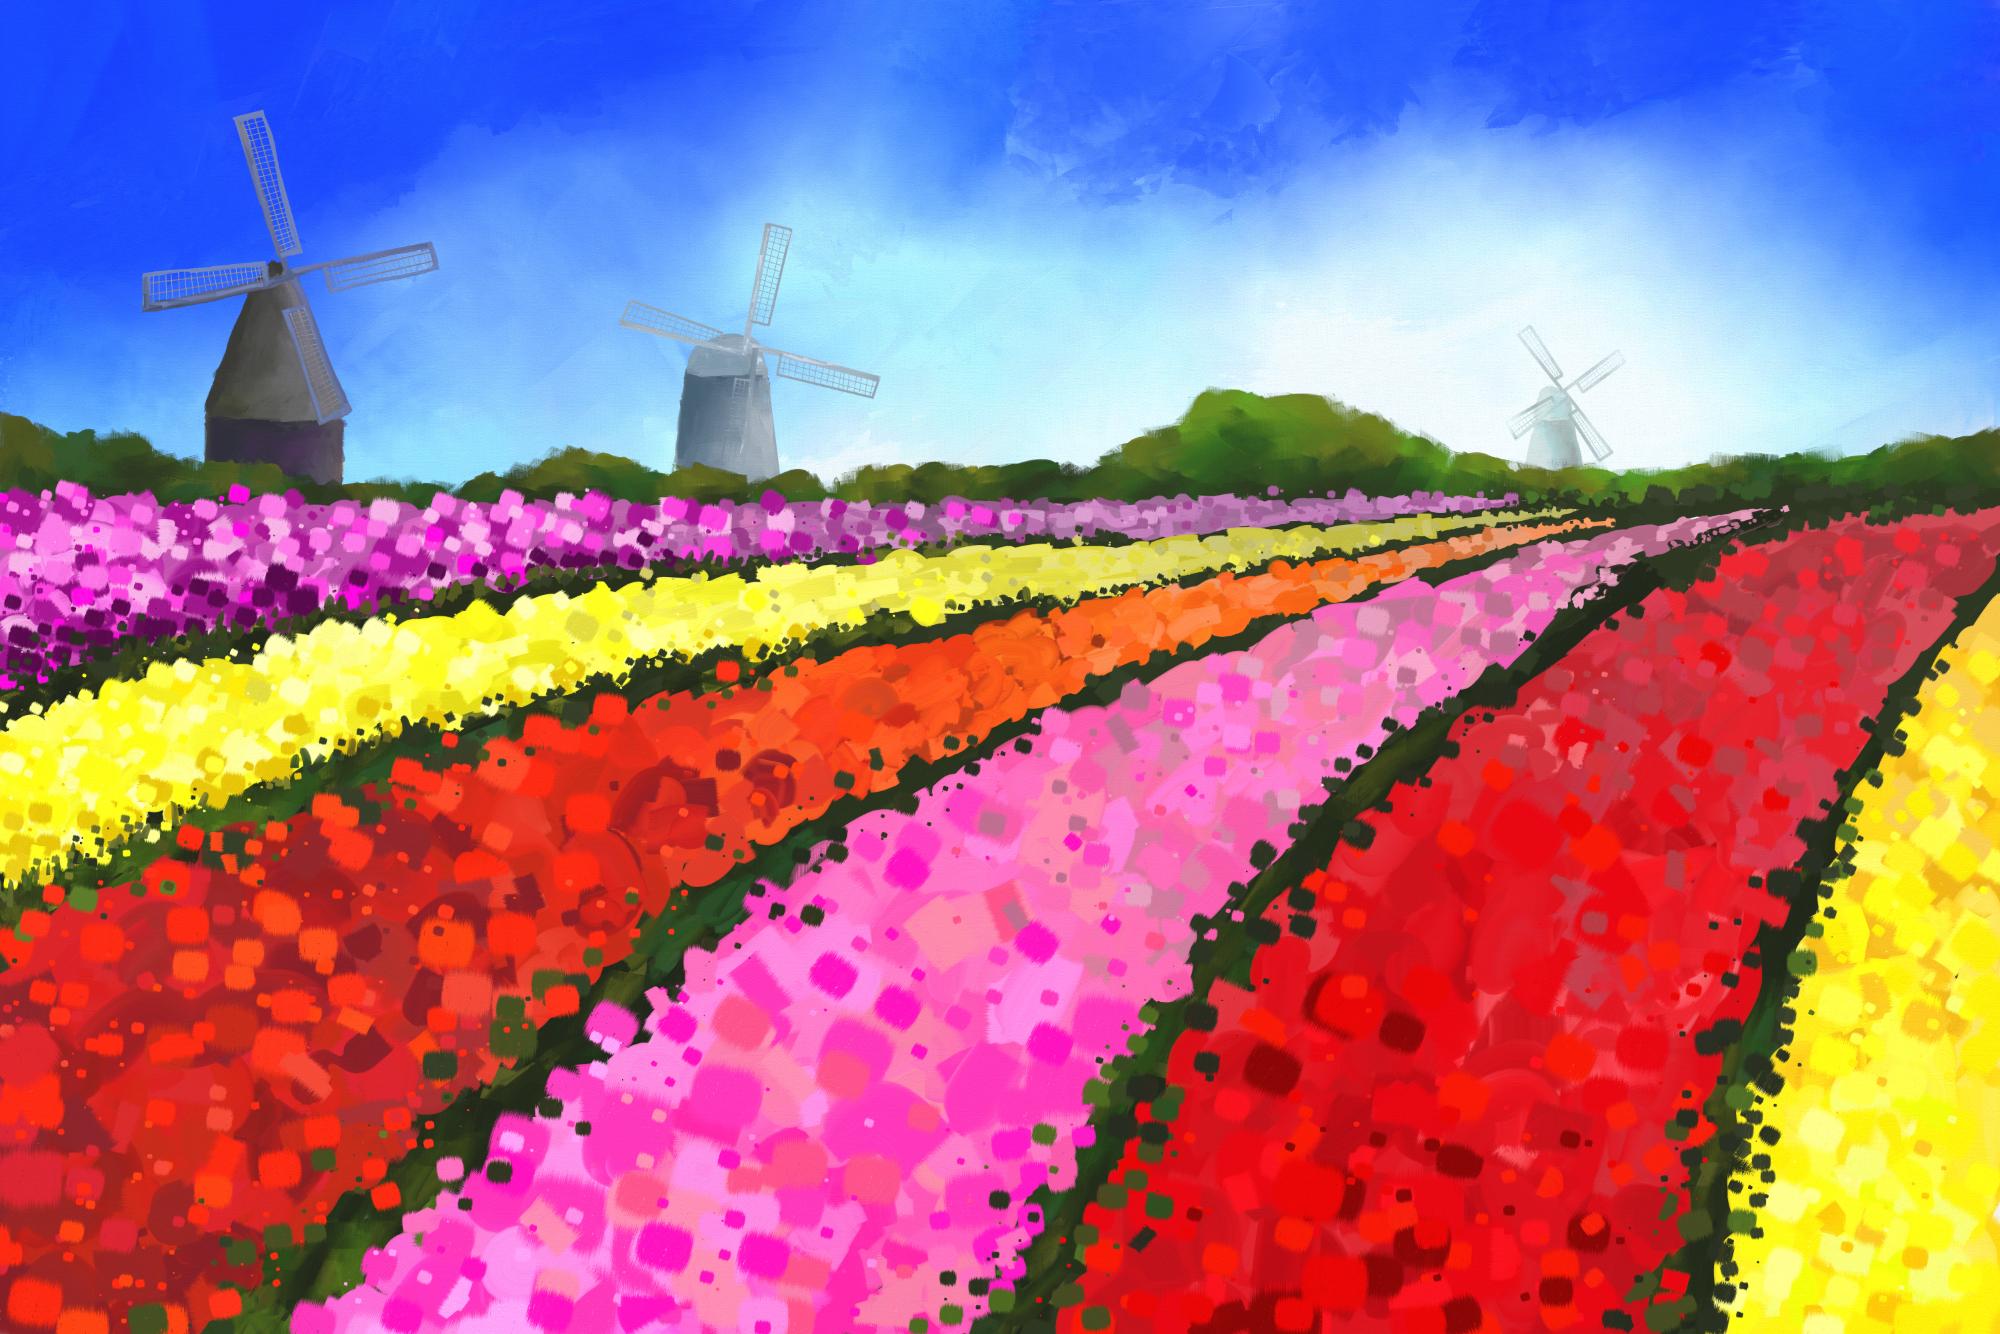 Digital acrylic painting of Dutch Tulip-fields with 3 Windmills